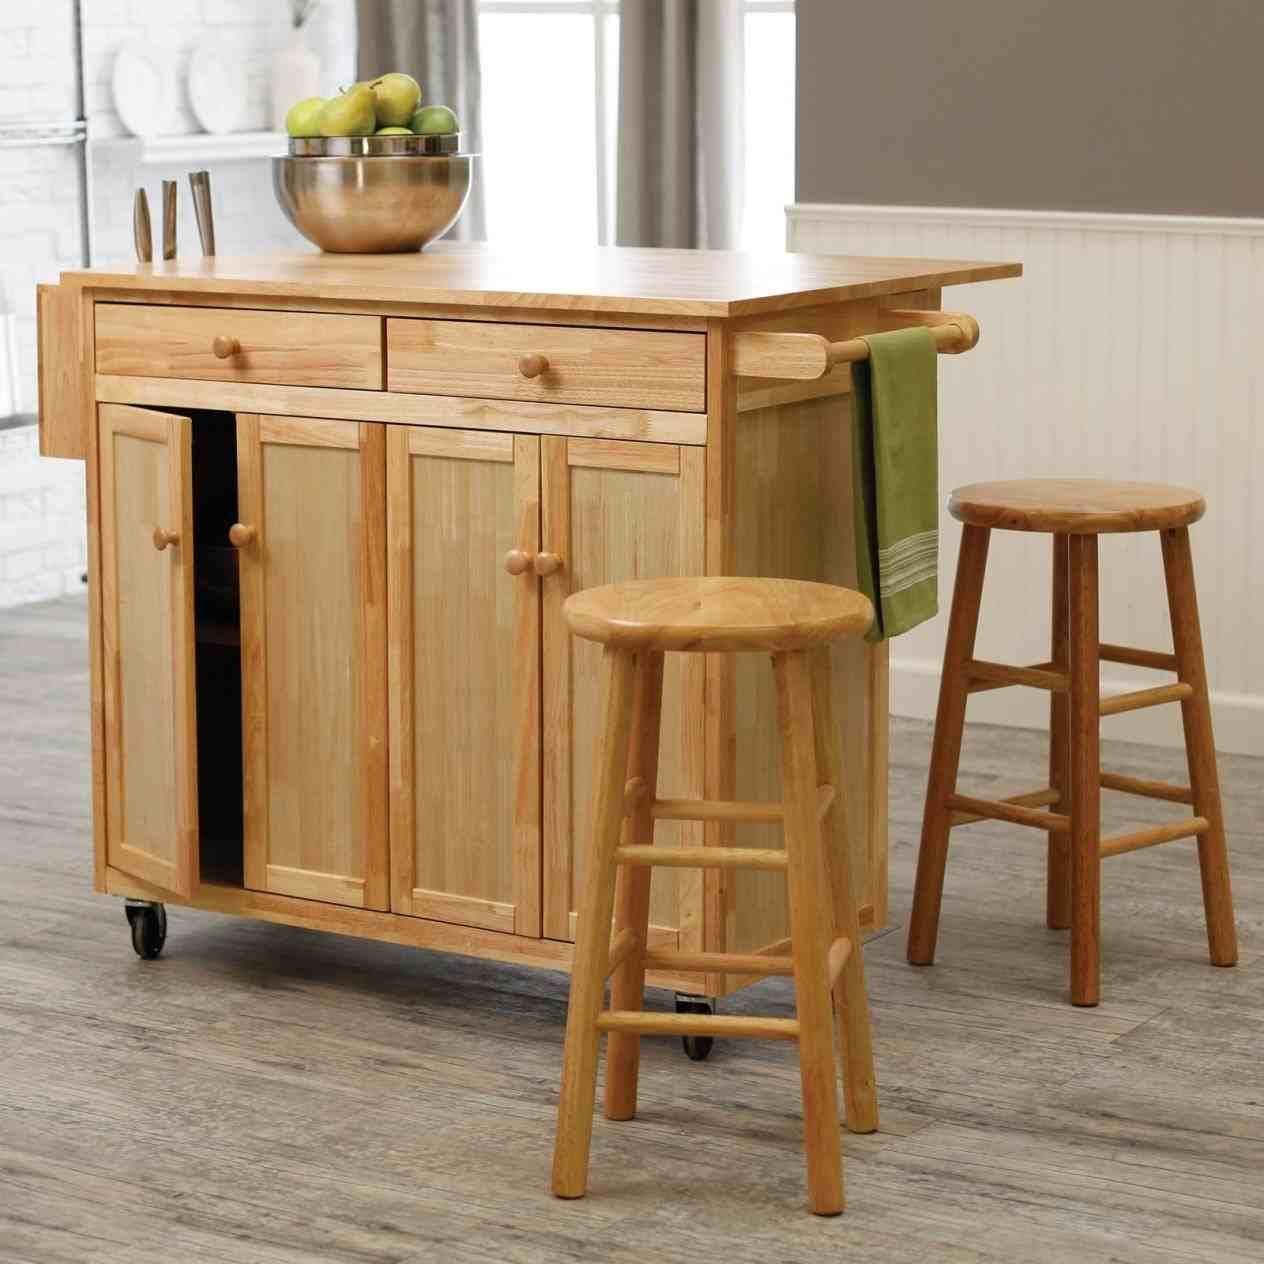 grey portable kitchen island | Home Ideas | Pinterest